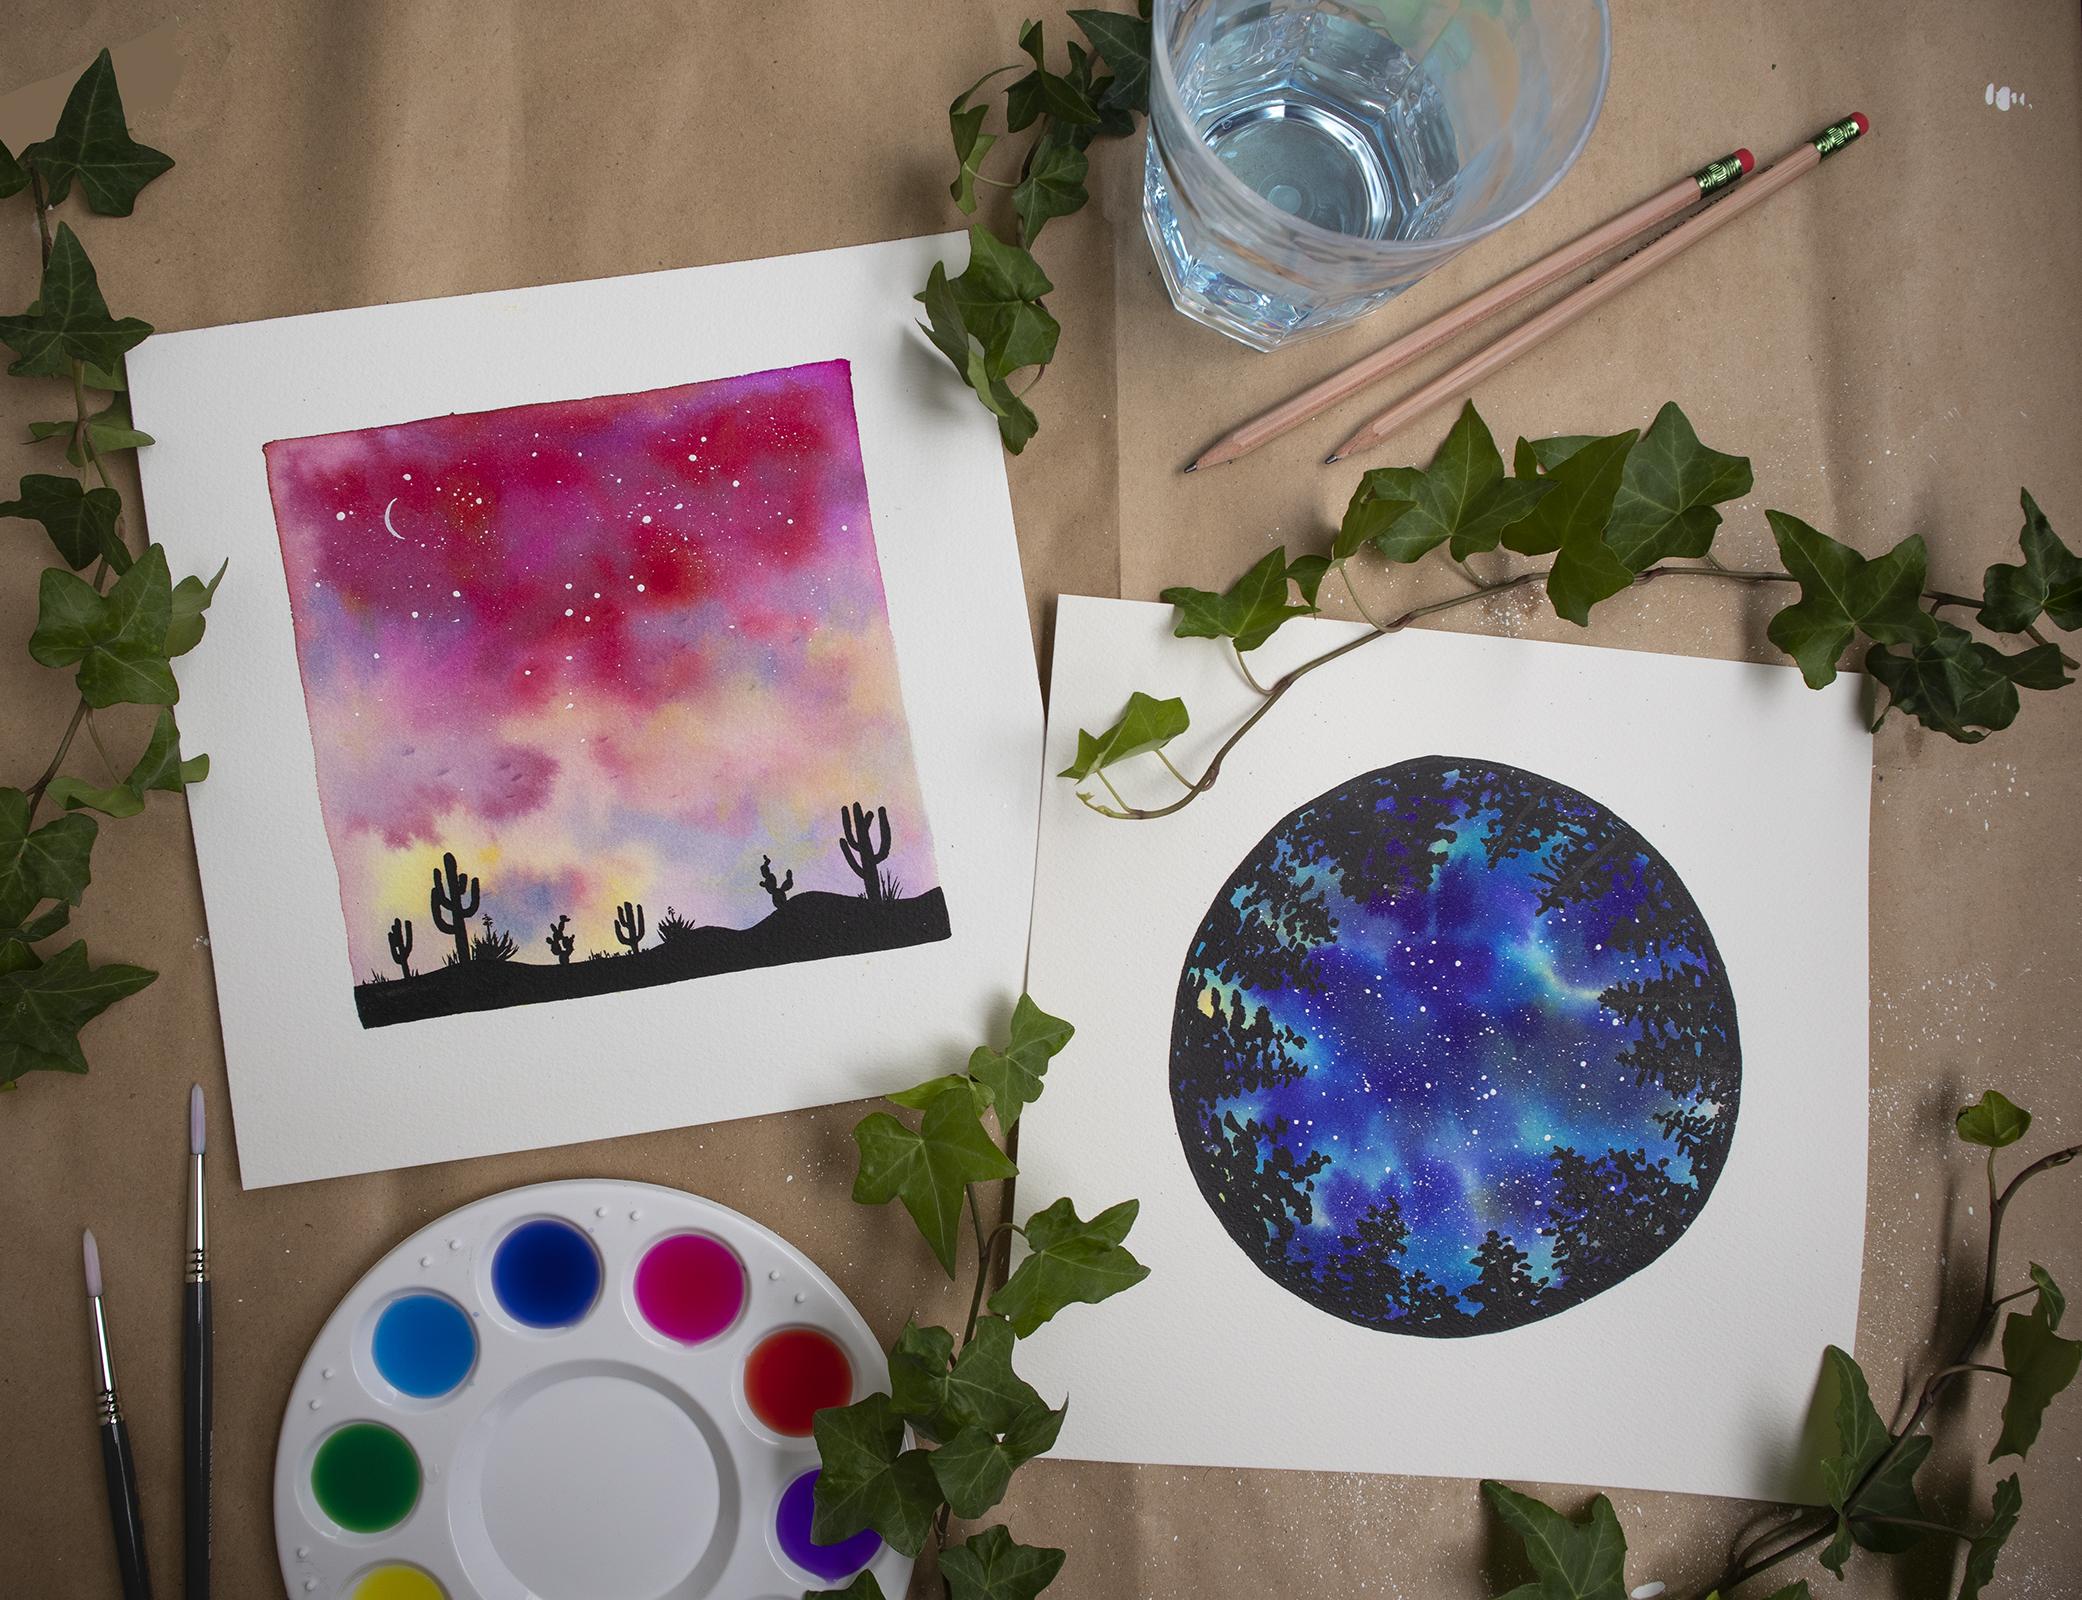 watercolour-galaxies-silhouettes